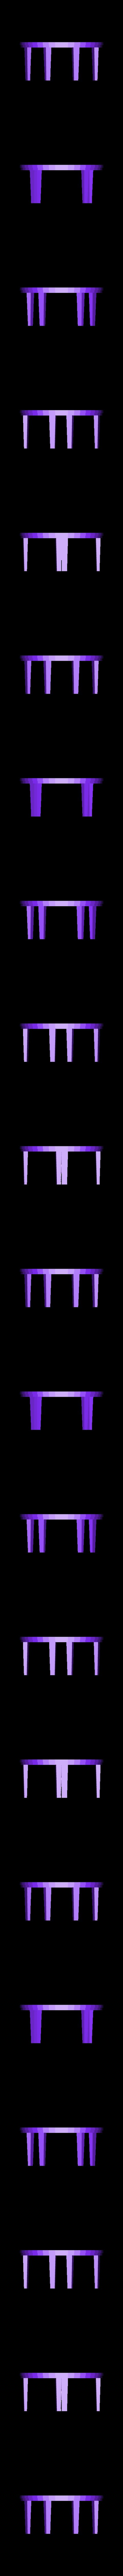 Mesa-redonda.obj Download free OBJ file Round table • 3D printing template, Superer012